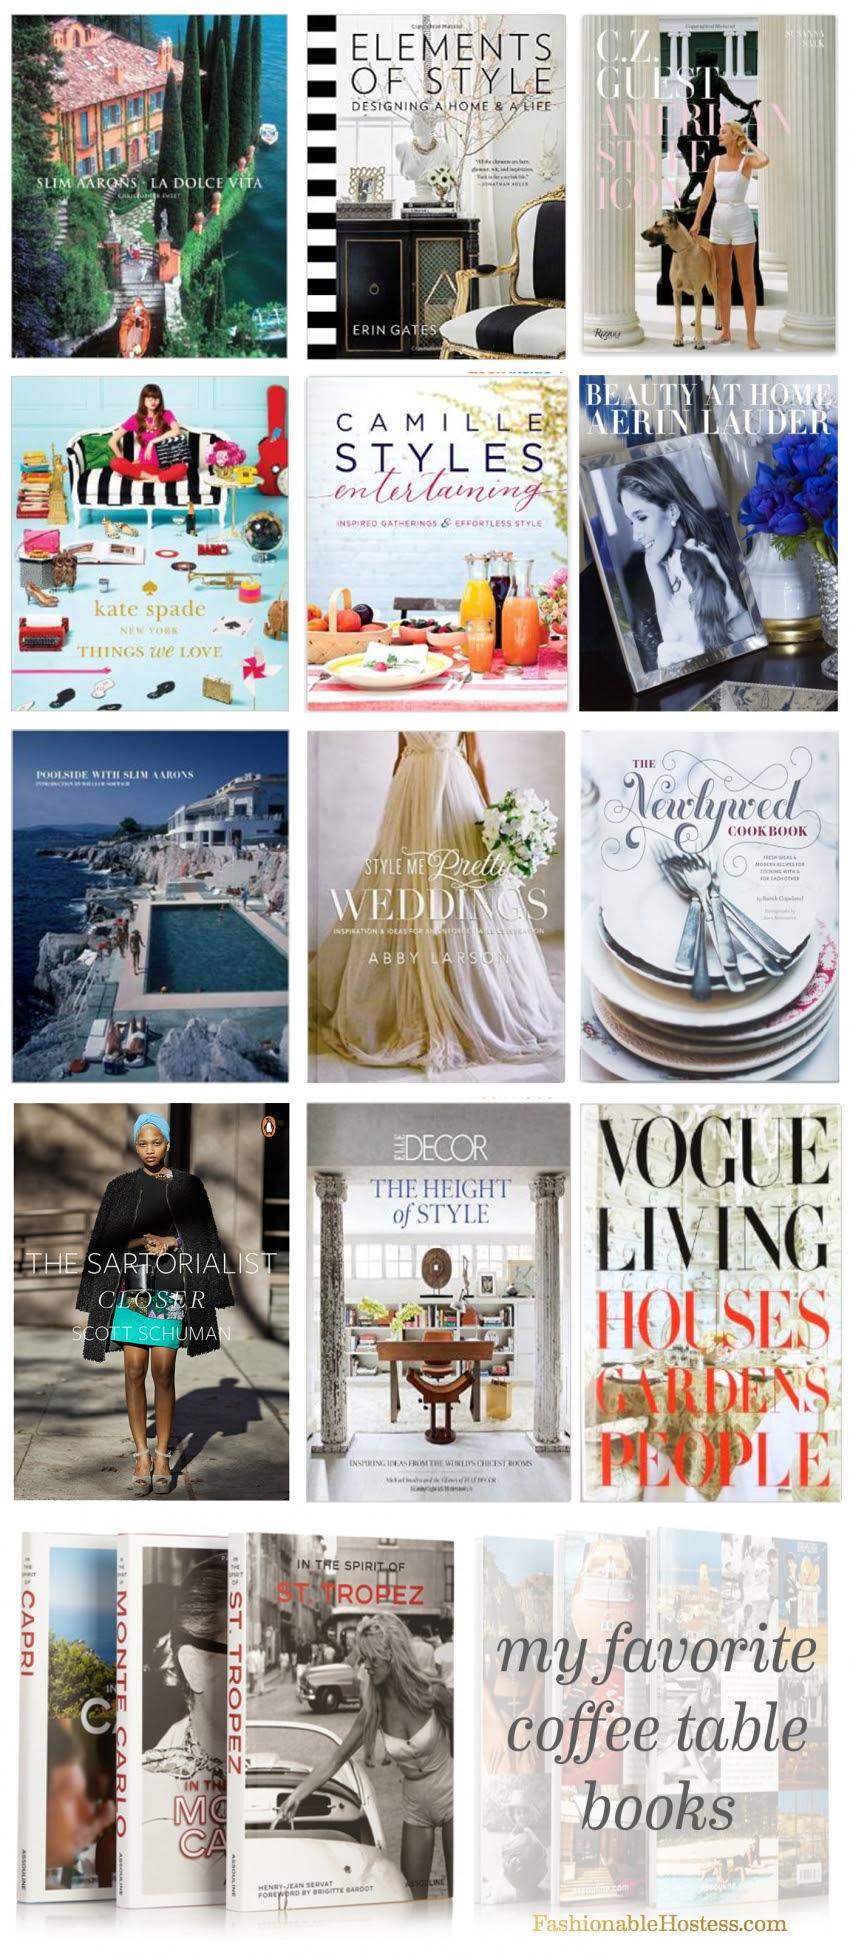 The Most Fashionable Coffee Table Books - Fashionable Hostess